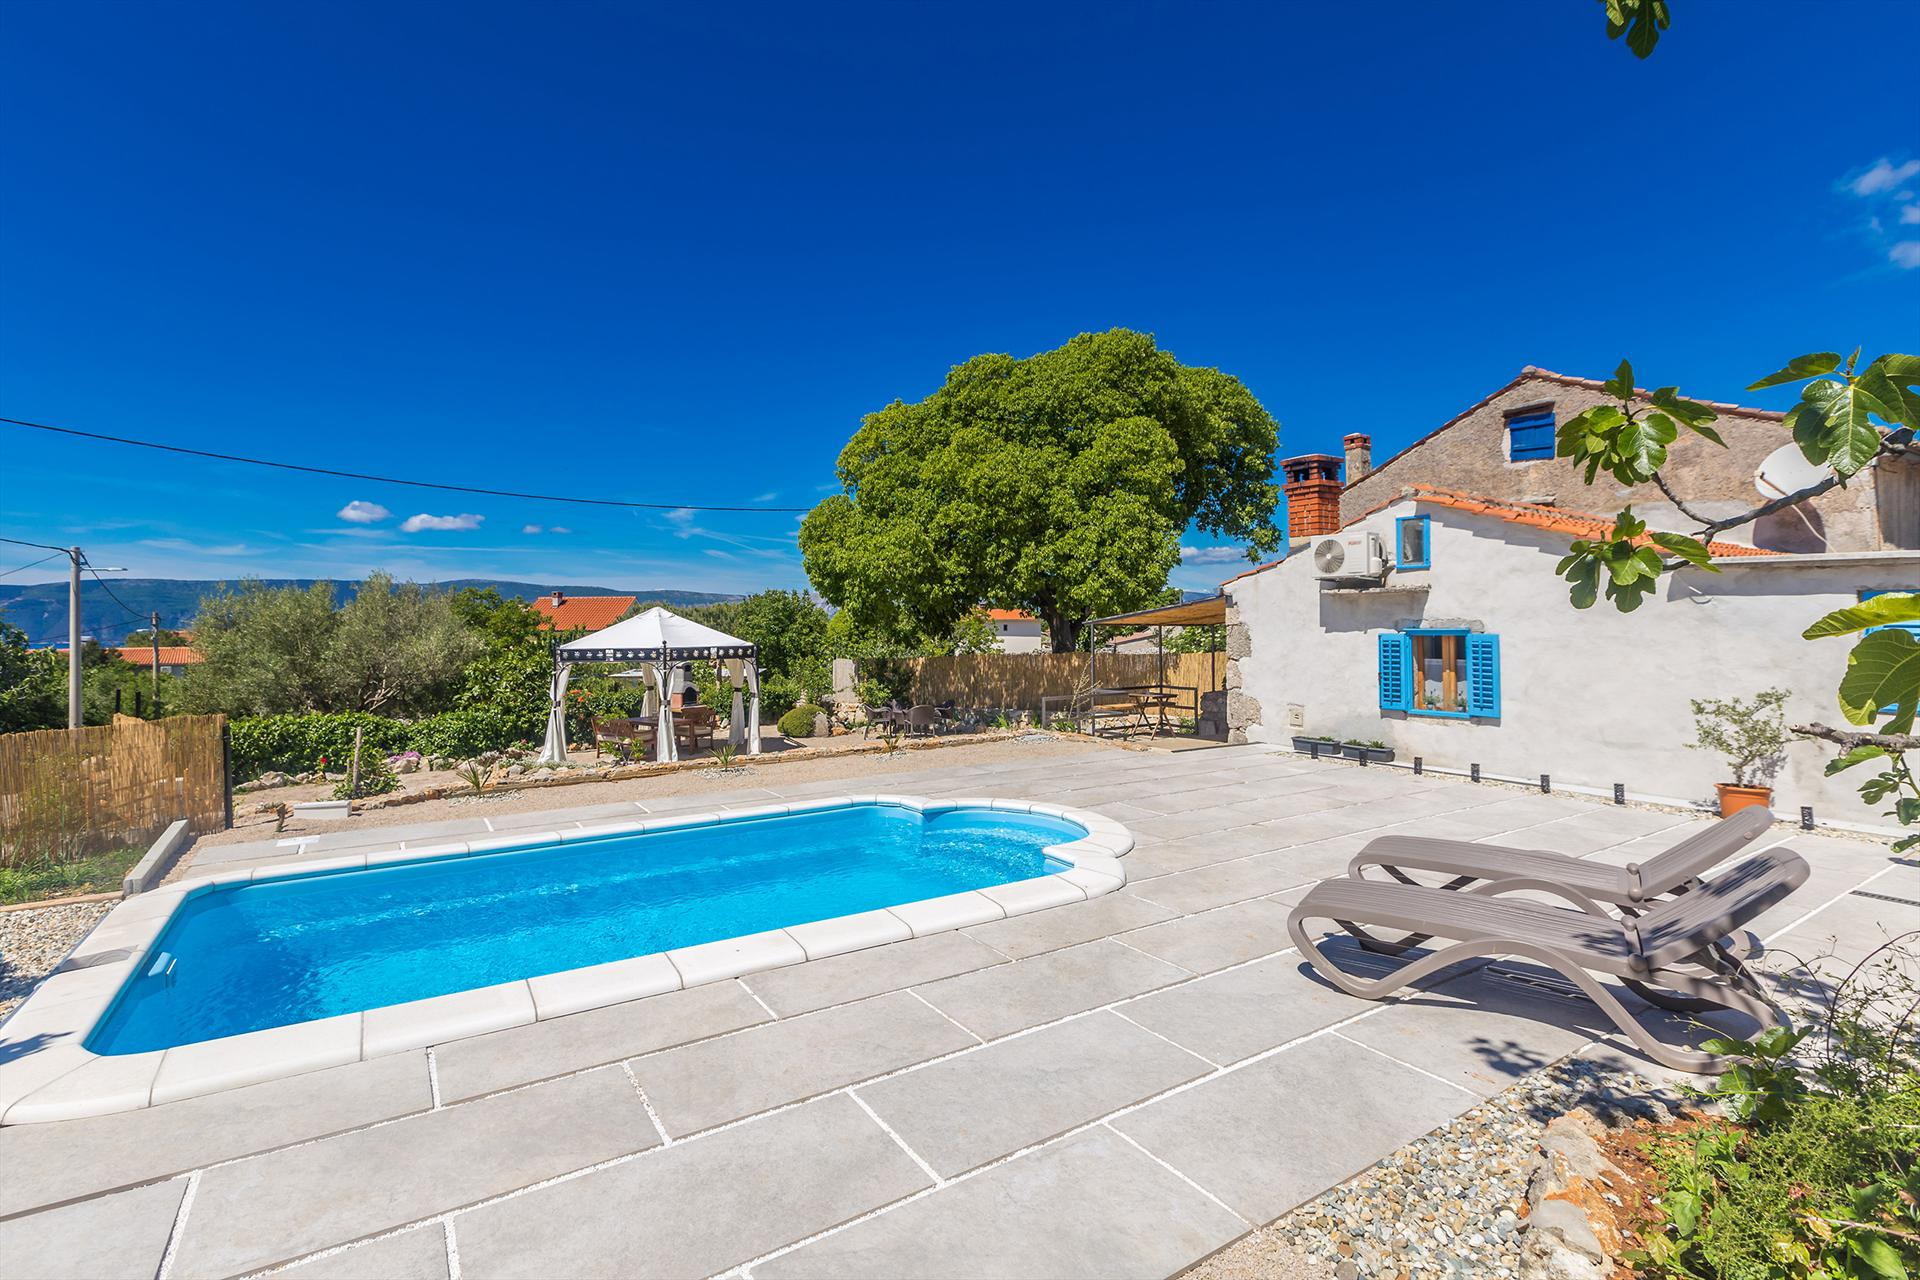 Enjoyable rustic holiday house - large yard, garden, private pool, green area,Vakantiehuis in Skrpčići, Island Krk, Kroatië  met privé zwembad voor 5 personen...